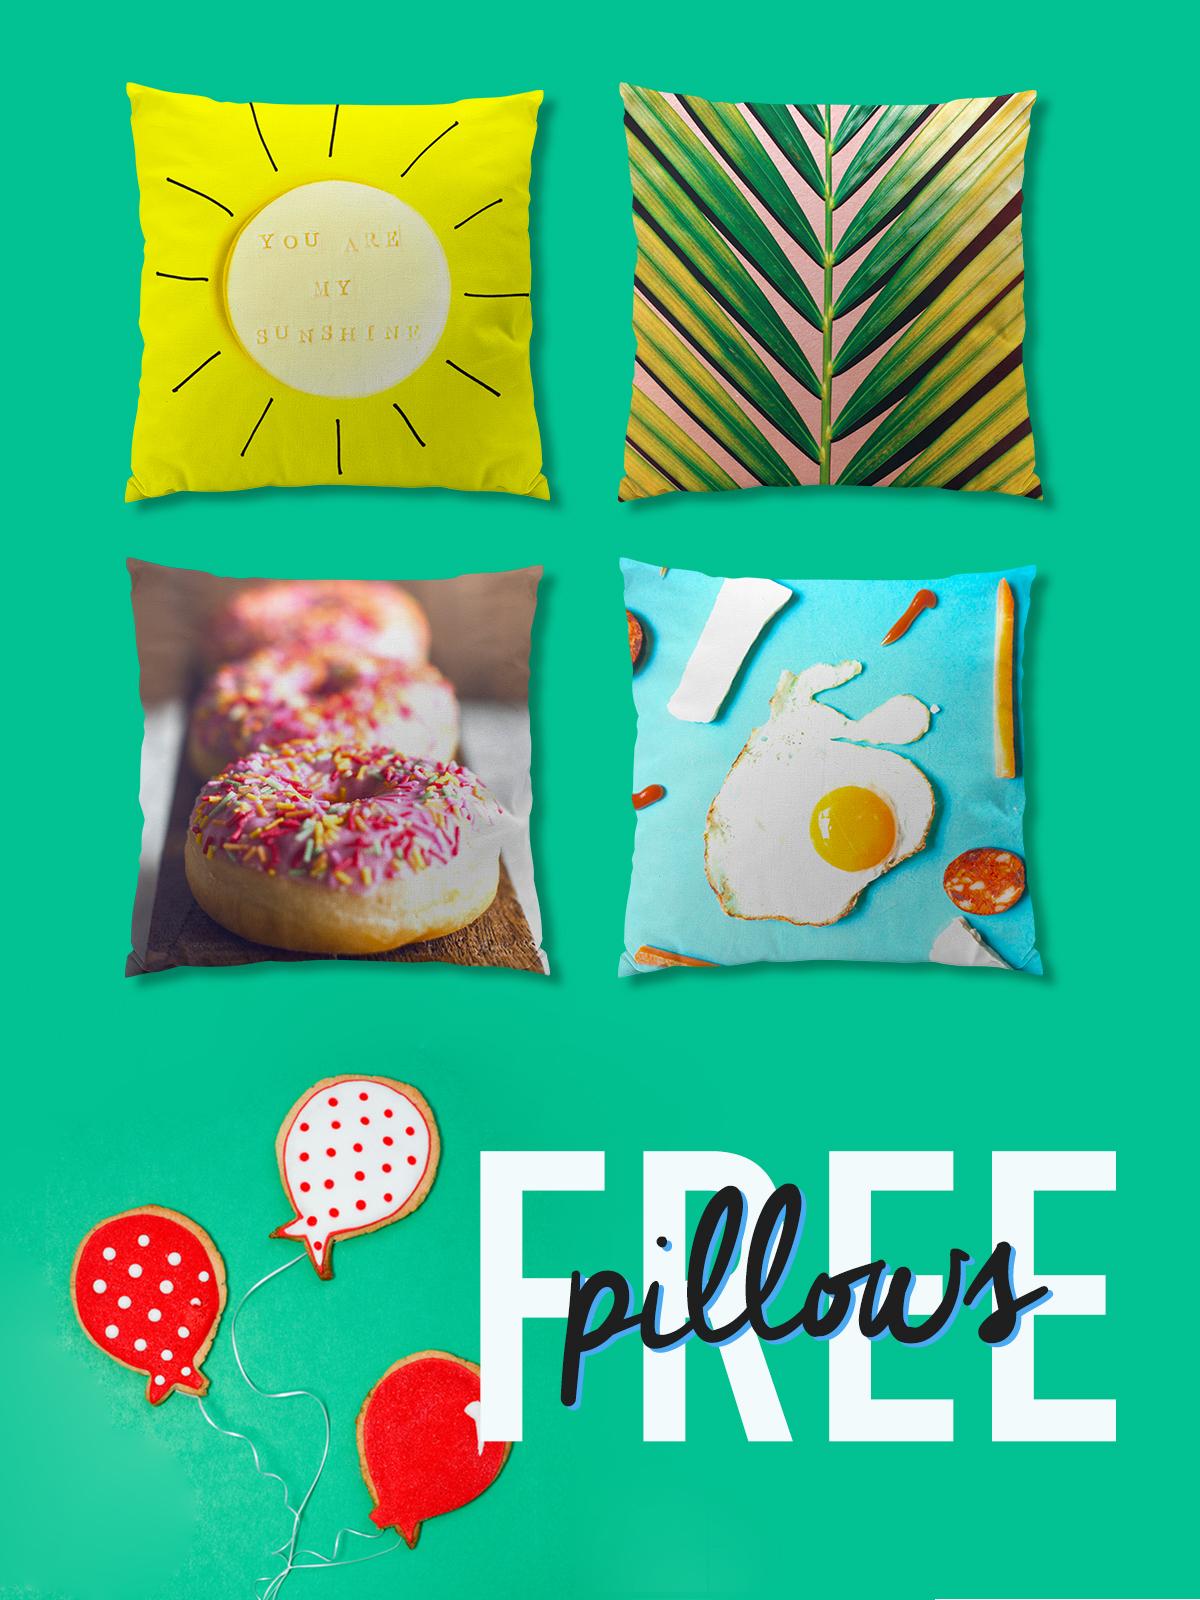 Free Pillows! - SnapBox Prints